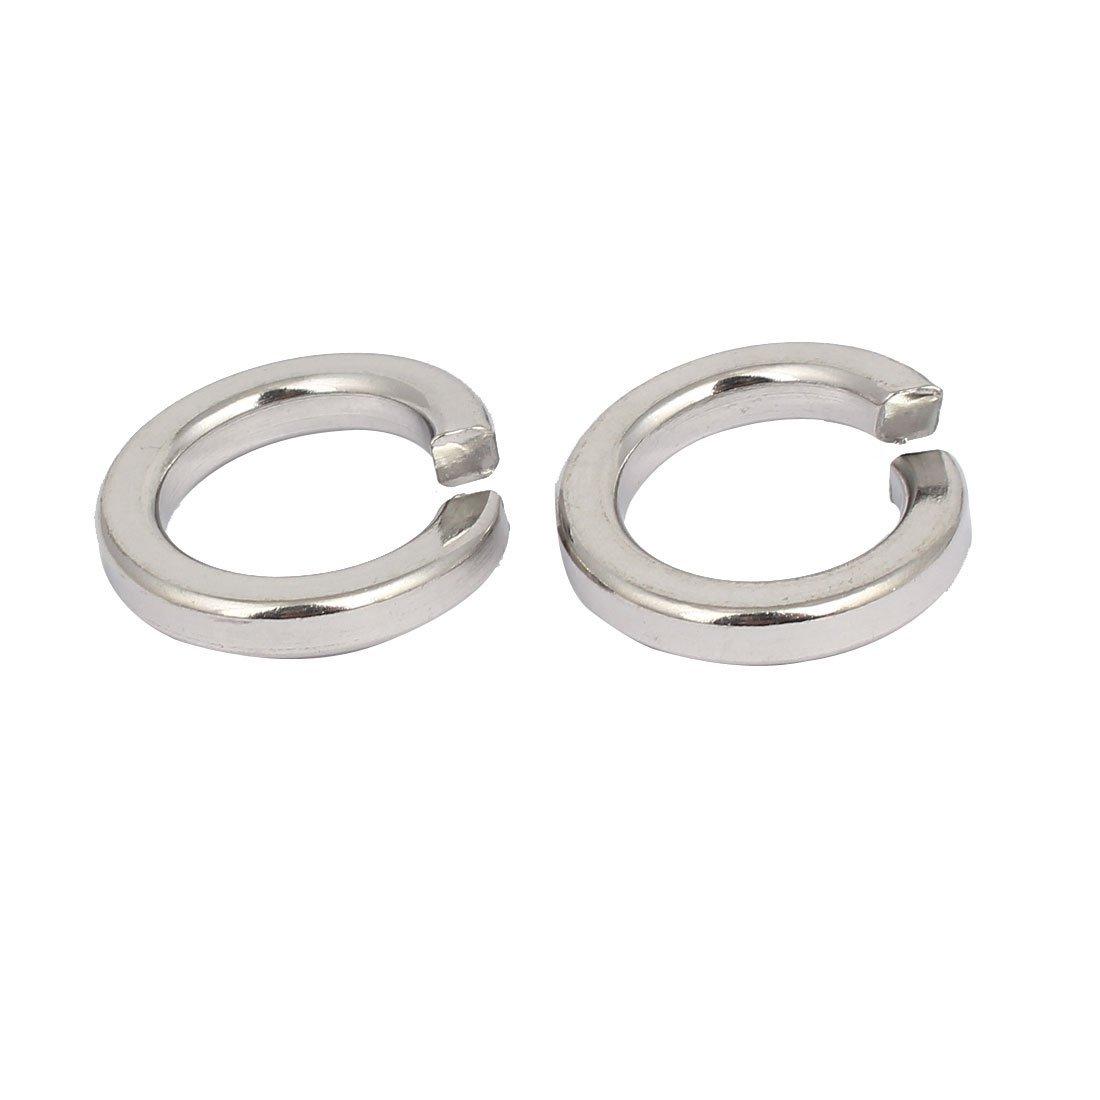 uxcell M20 Inner Diameter 316 Stainless Steel Split Lock Spring Washers Gasket 2pcs